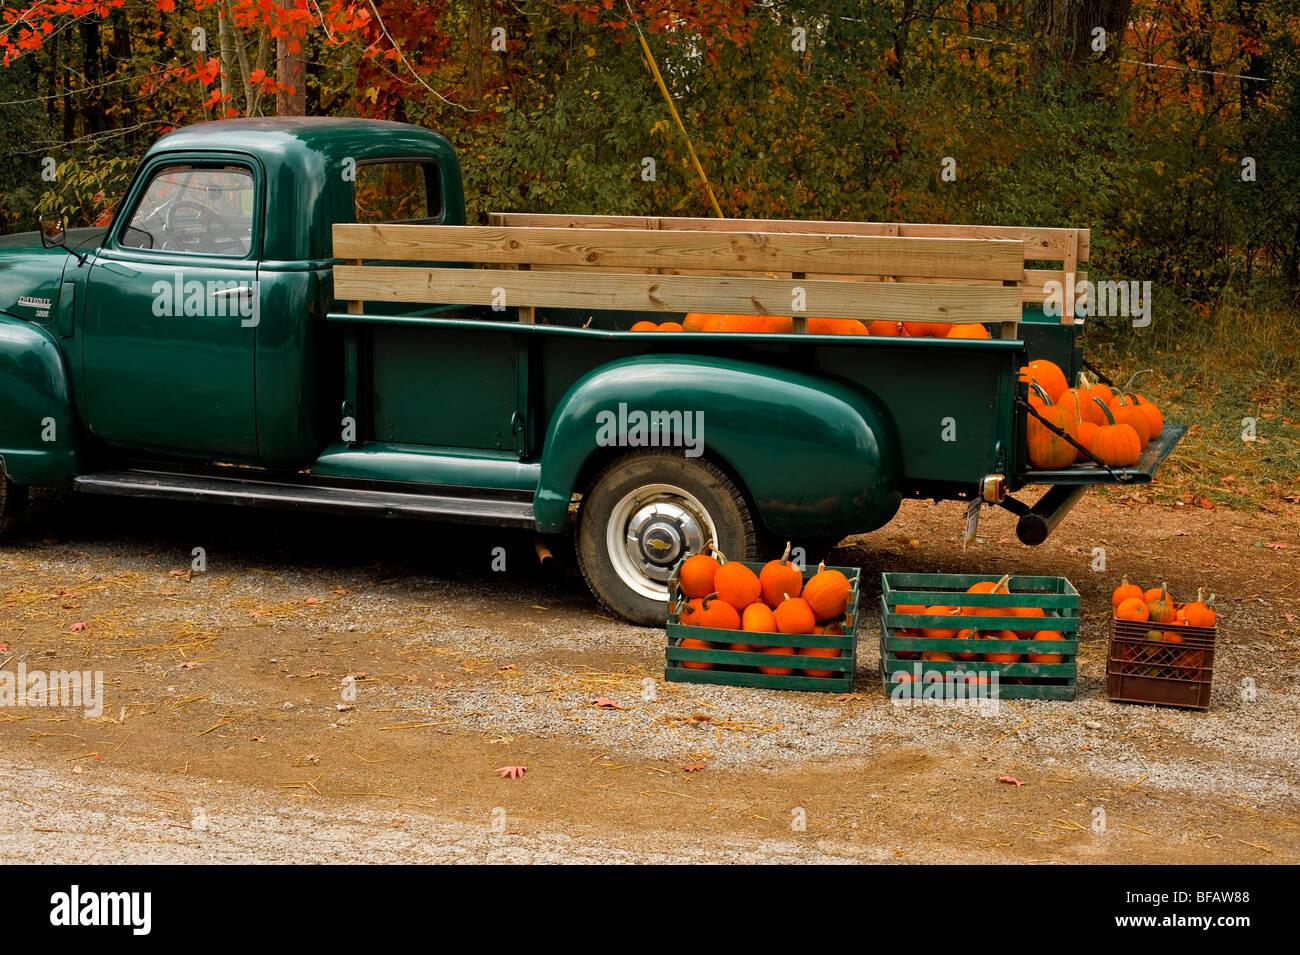 Amazing Old Pick Up Truck Contemporary - Classic Cars Ideas - boiq.info